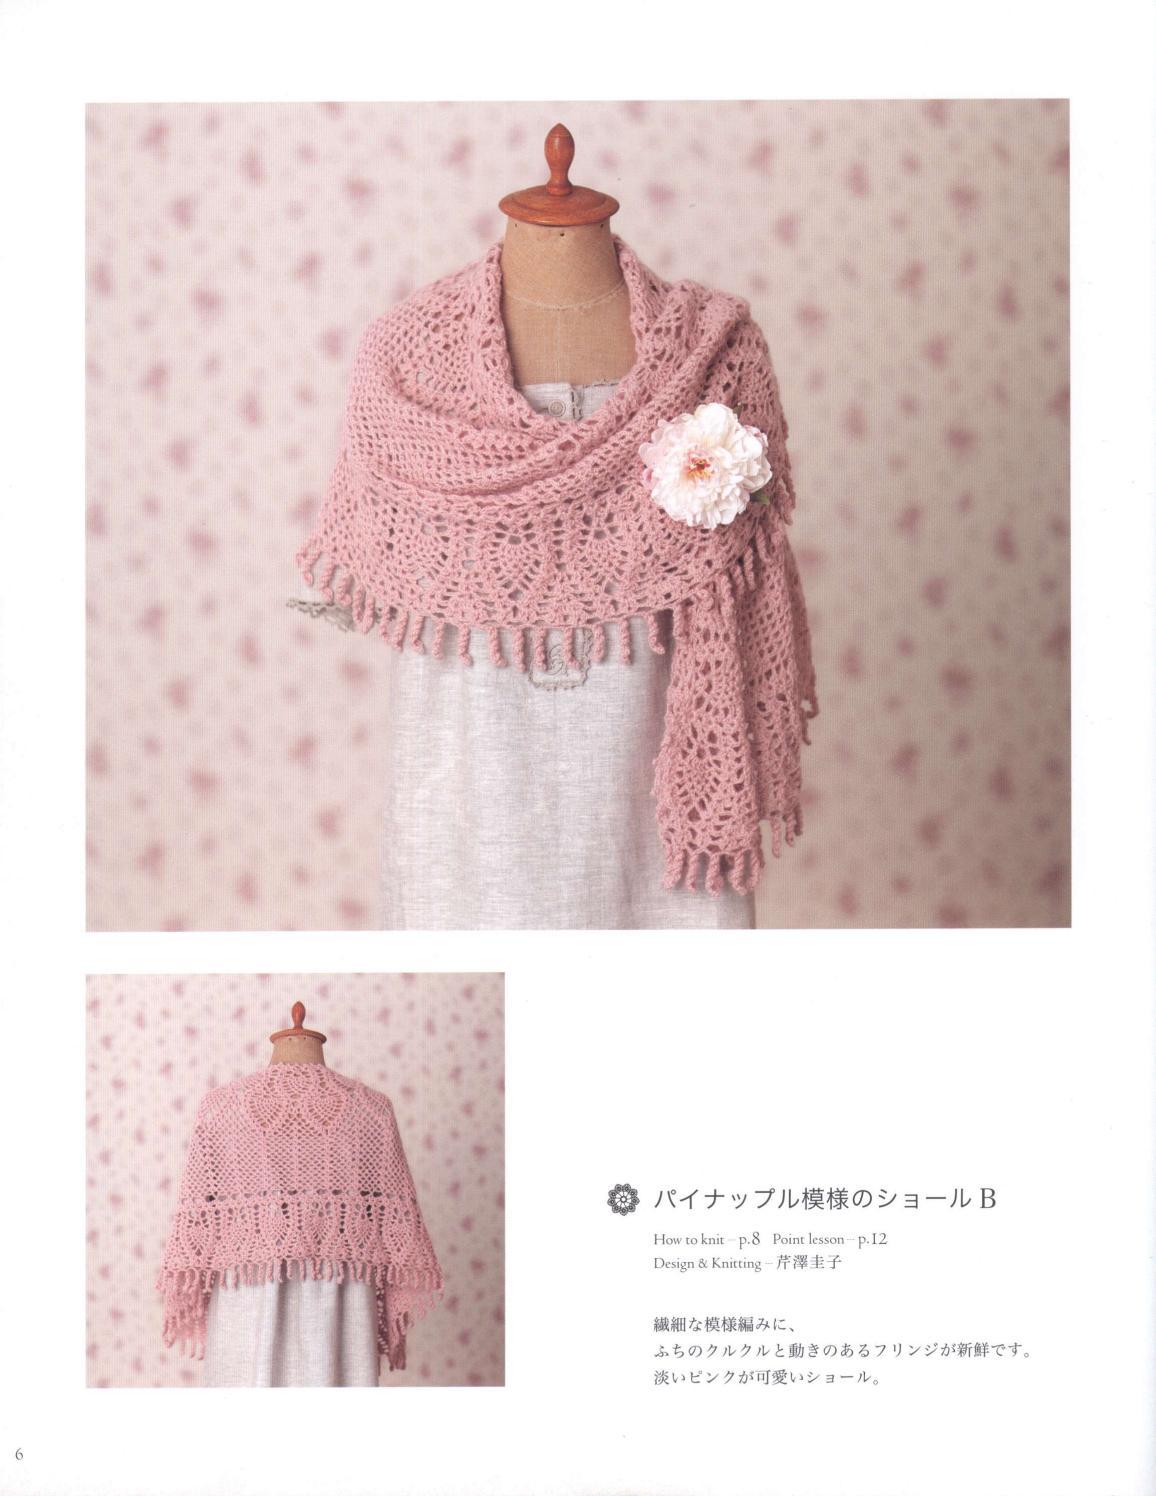 Asahi original crochet best selection 2012 page 6